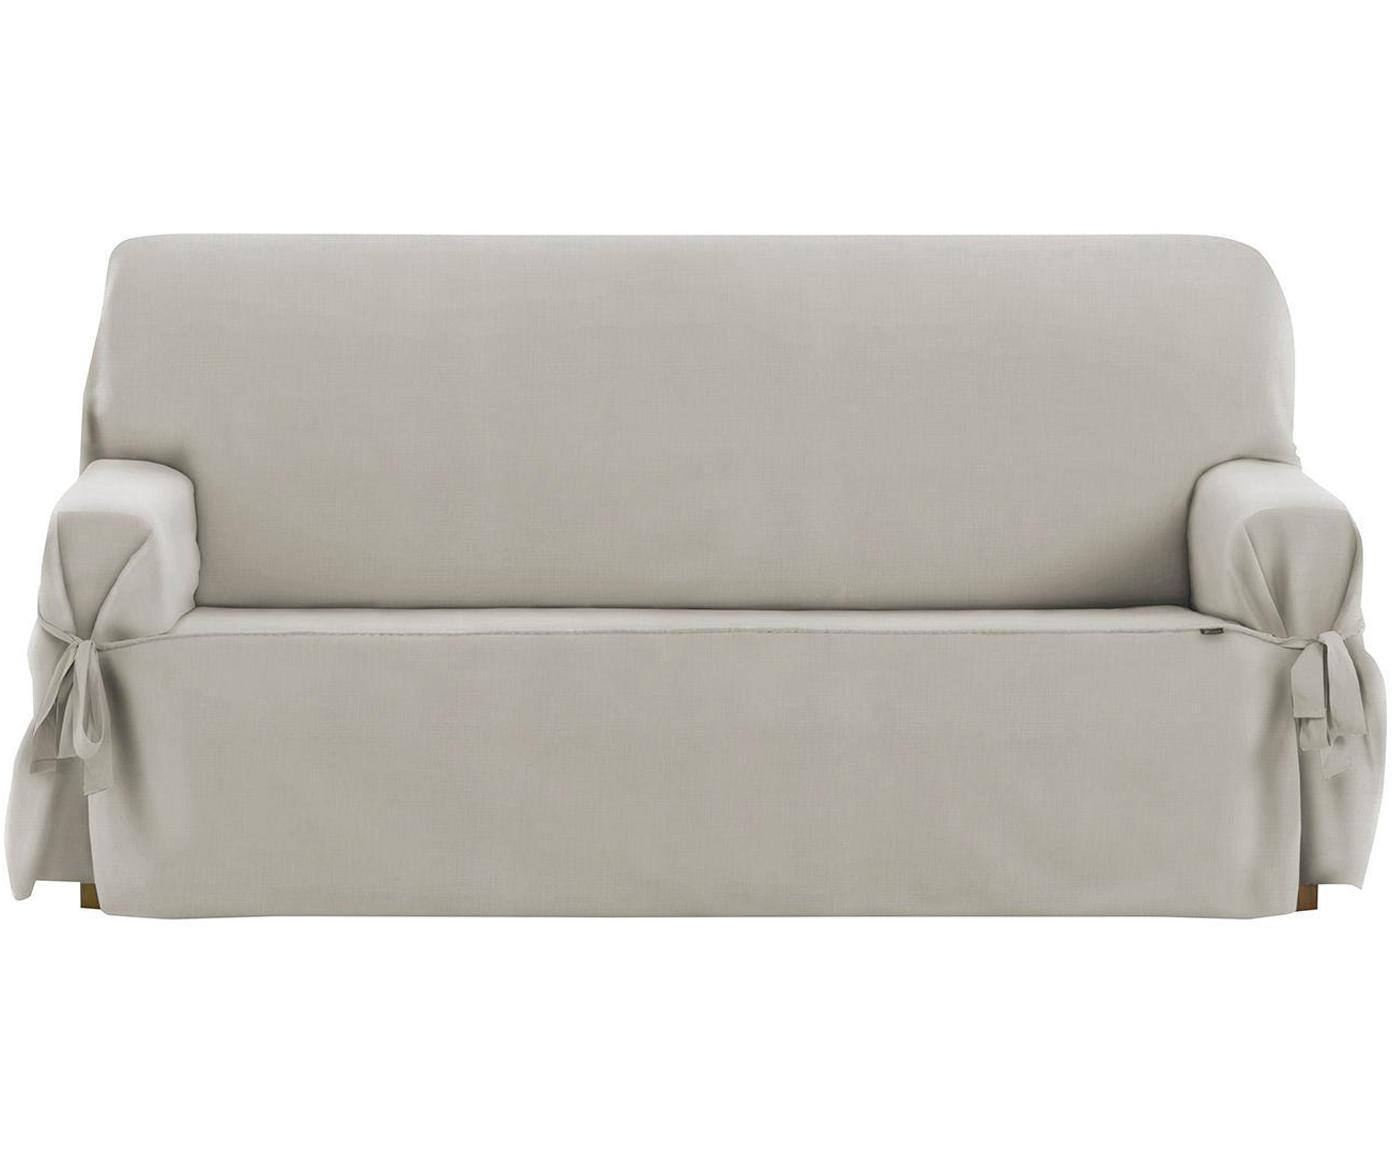 Funda de sofá Levante, 50%algodón, 50%poliéster, Gris verdoso, 2 plazas (180 x 110cm)